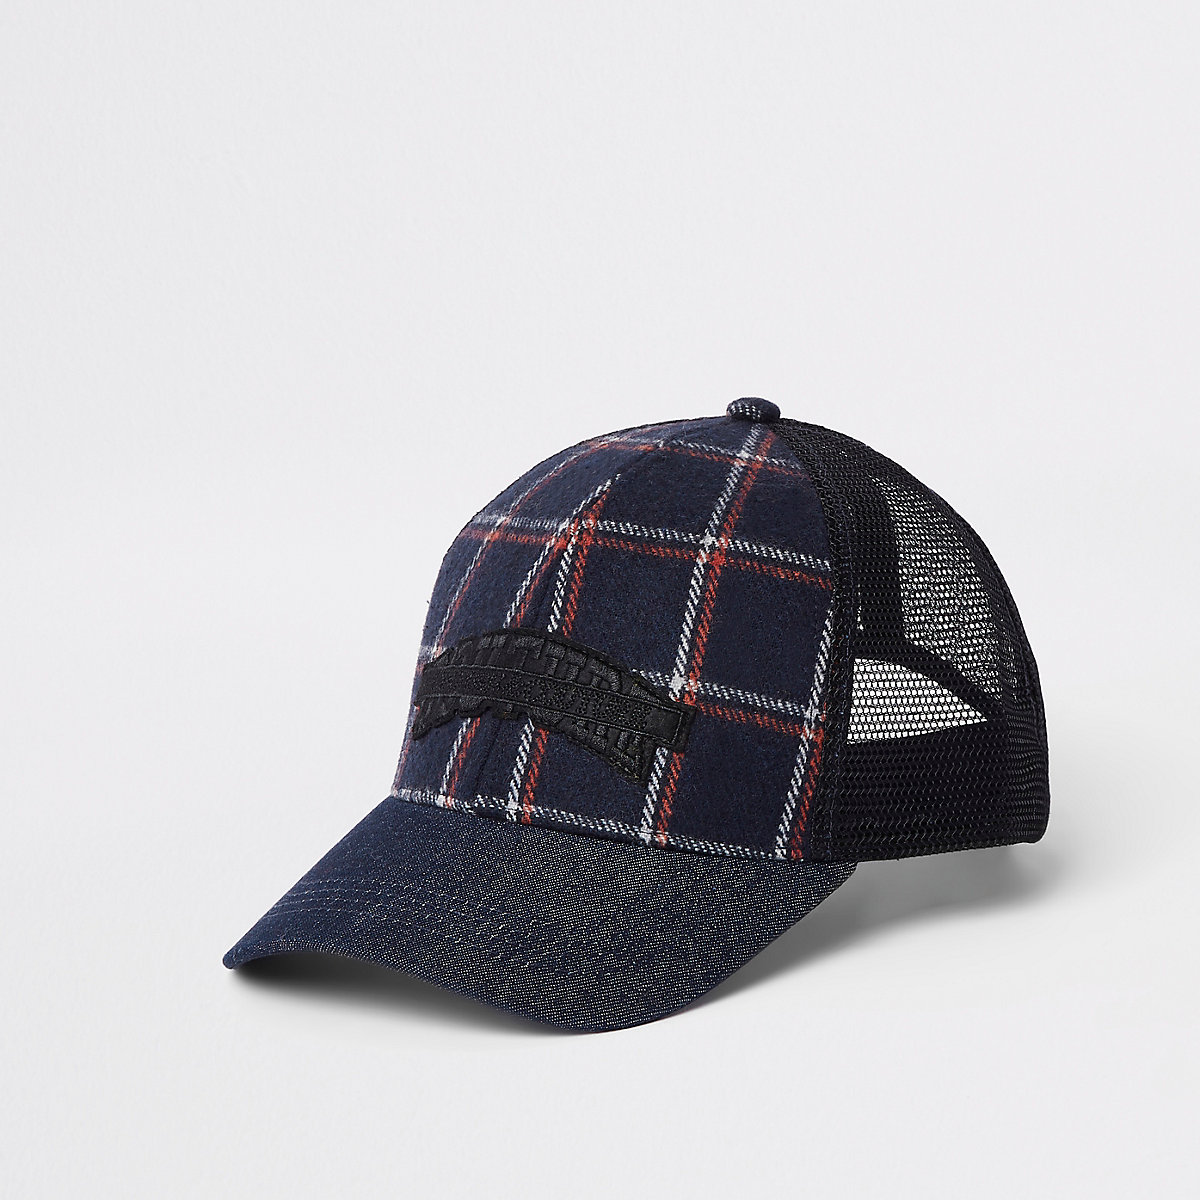 Navy check denim mesh baseball cap